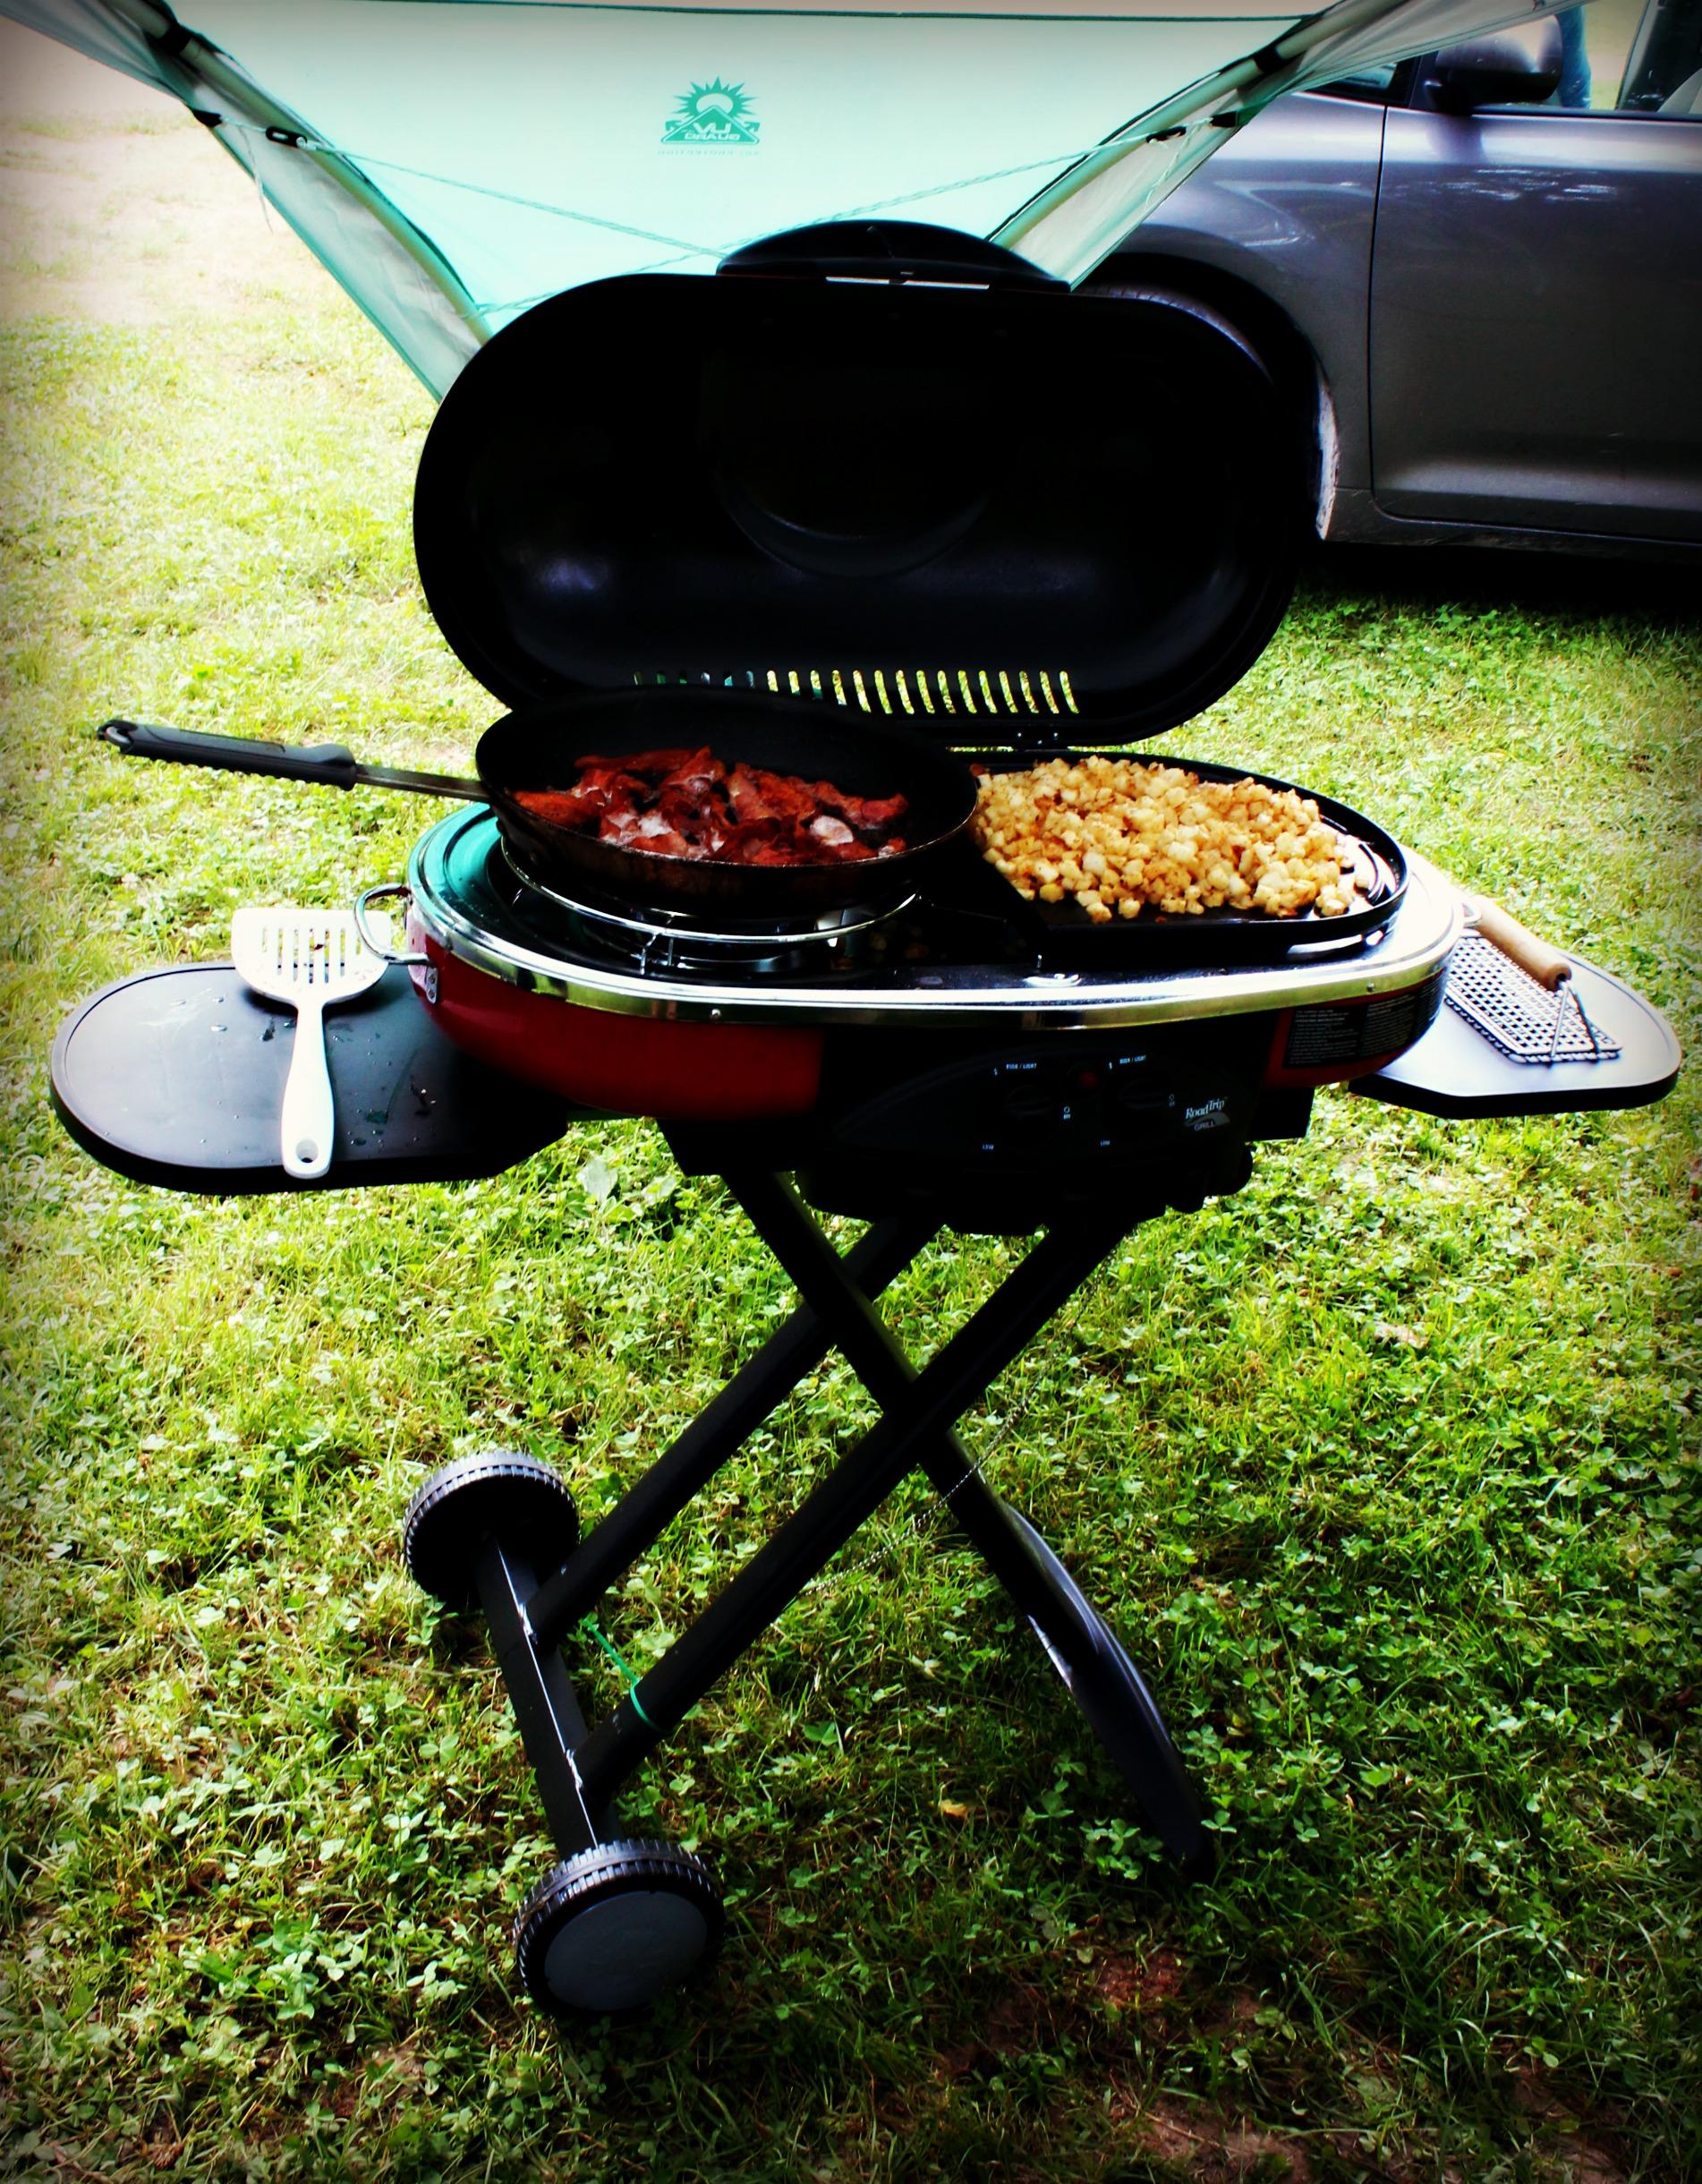 coleman-road-trip-portable-grill